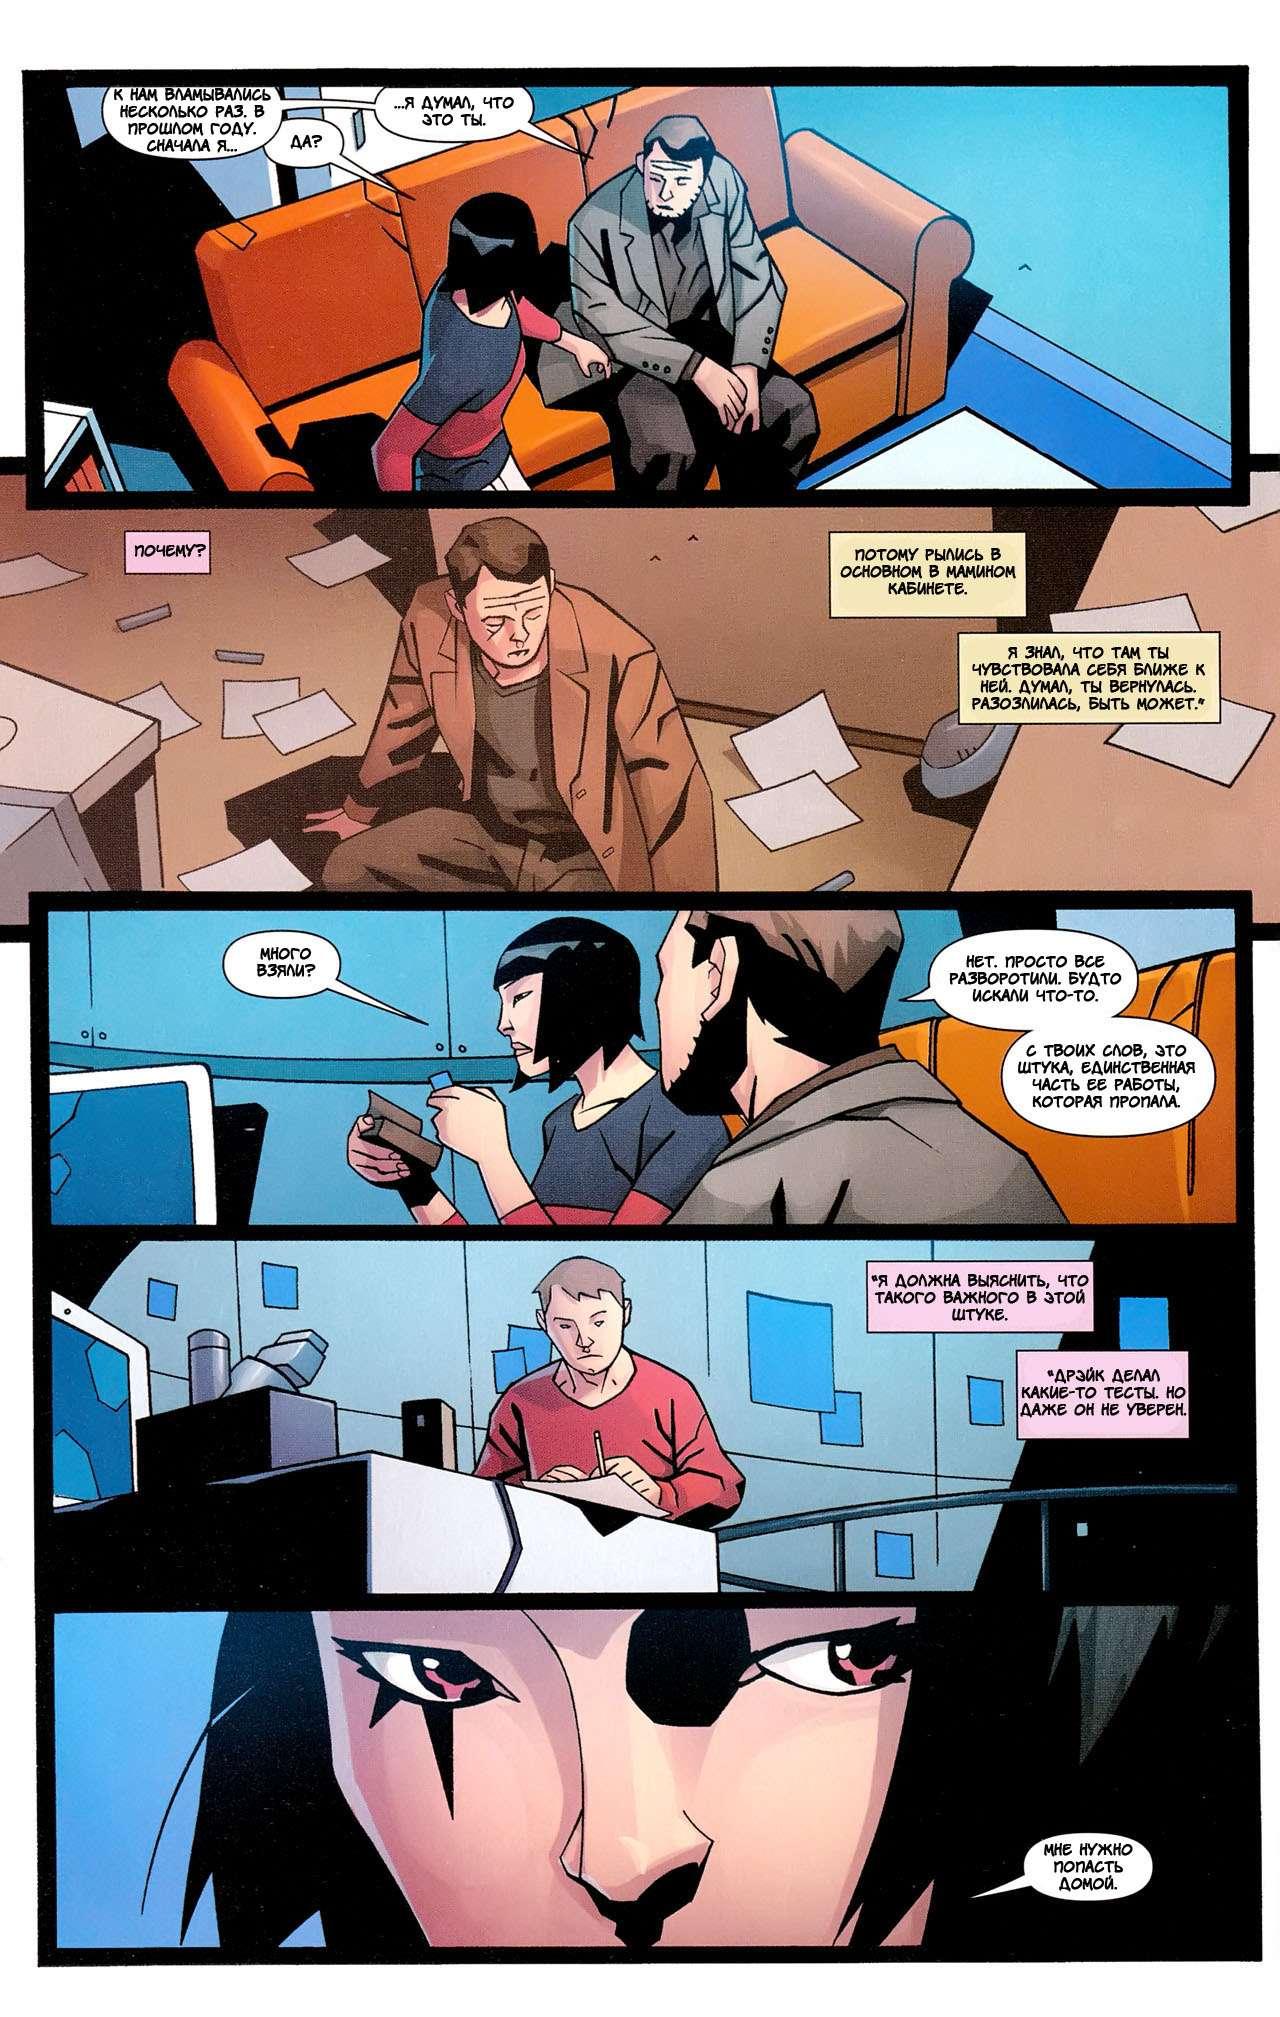 mirrors-edge-05-pg-15